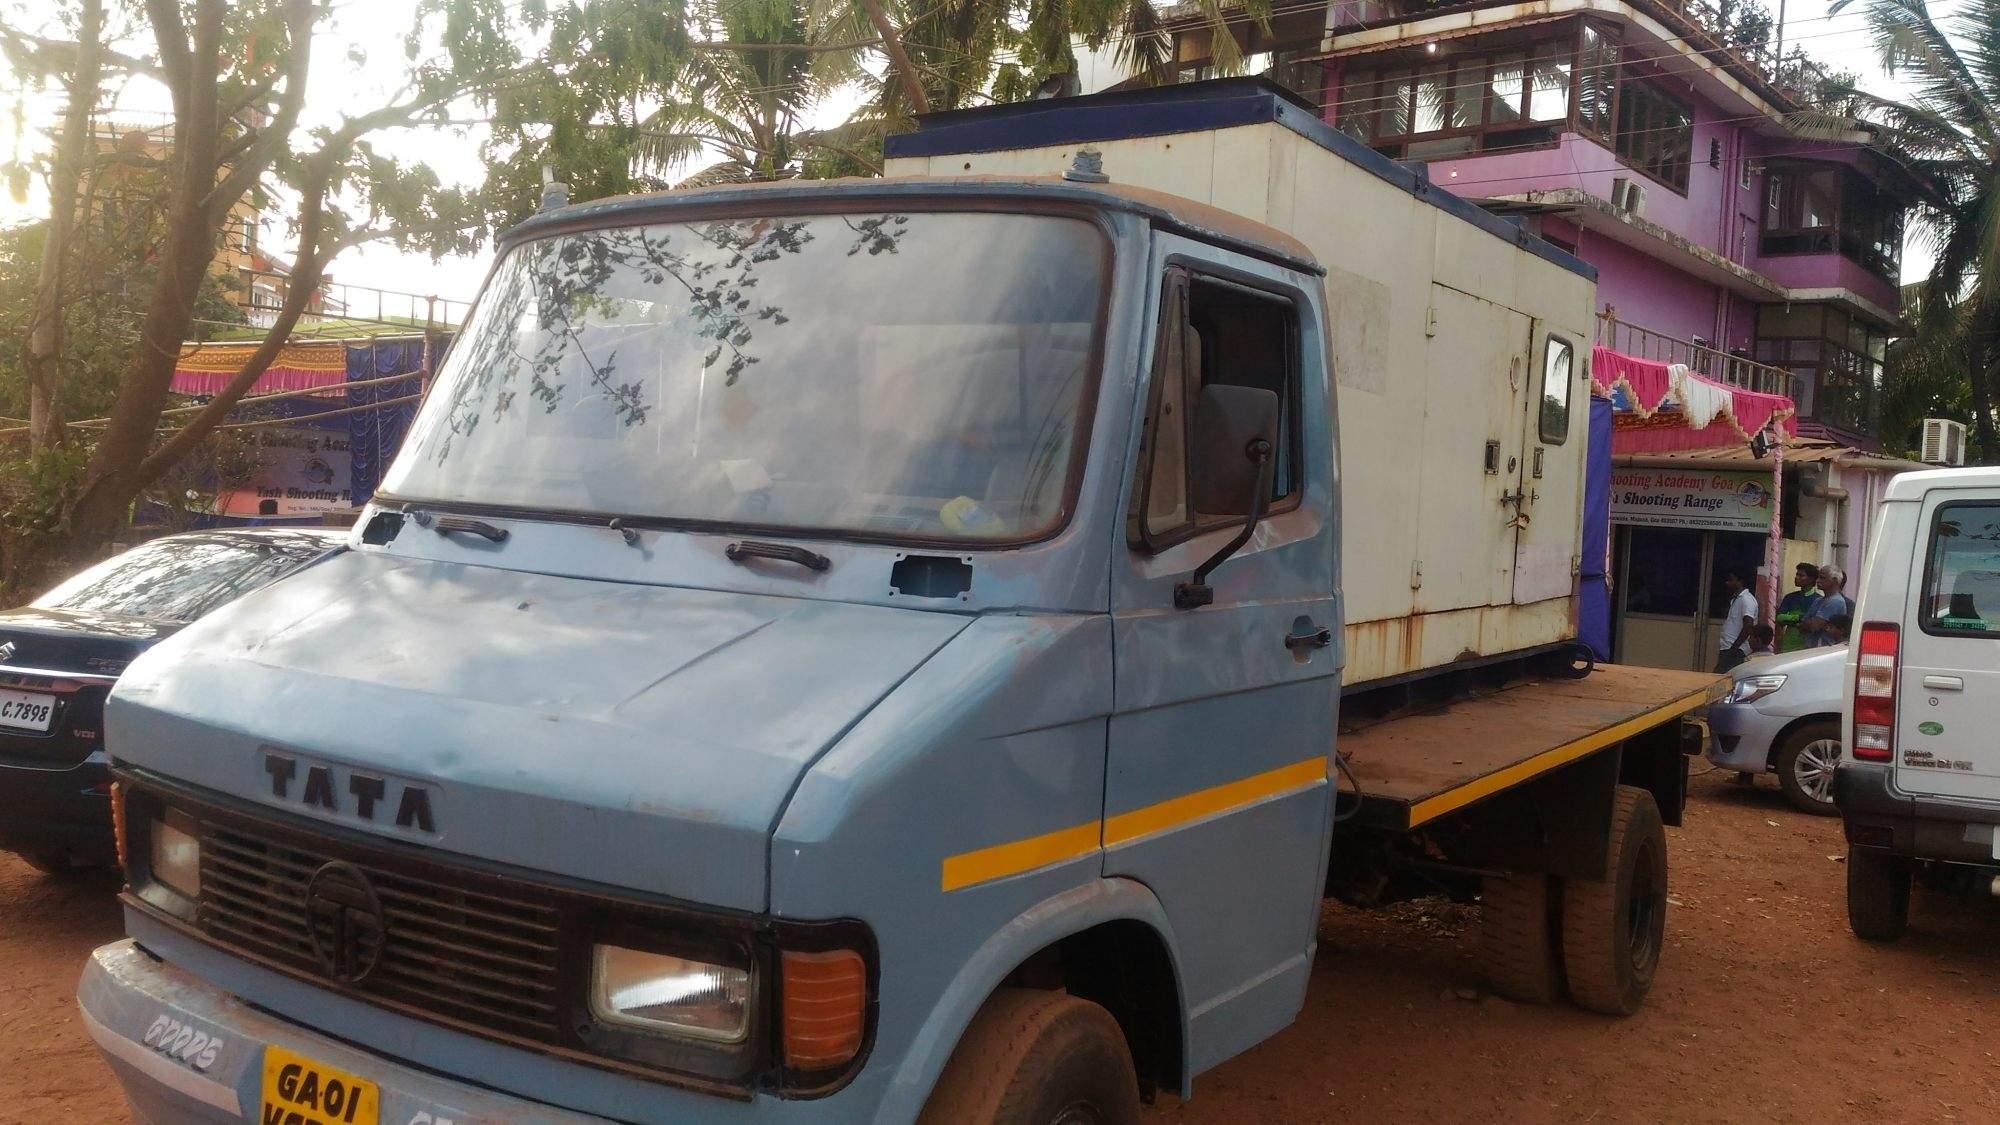 Top 30 Generator Repair Services in Goa - Best Generator Service